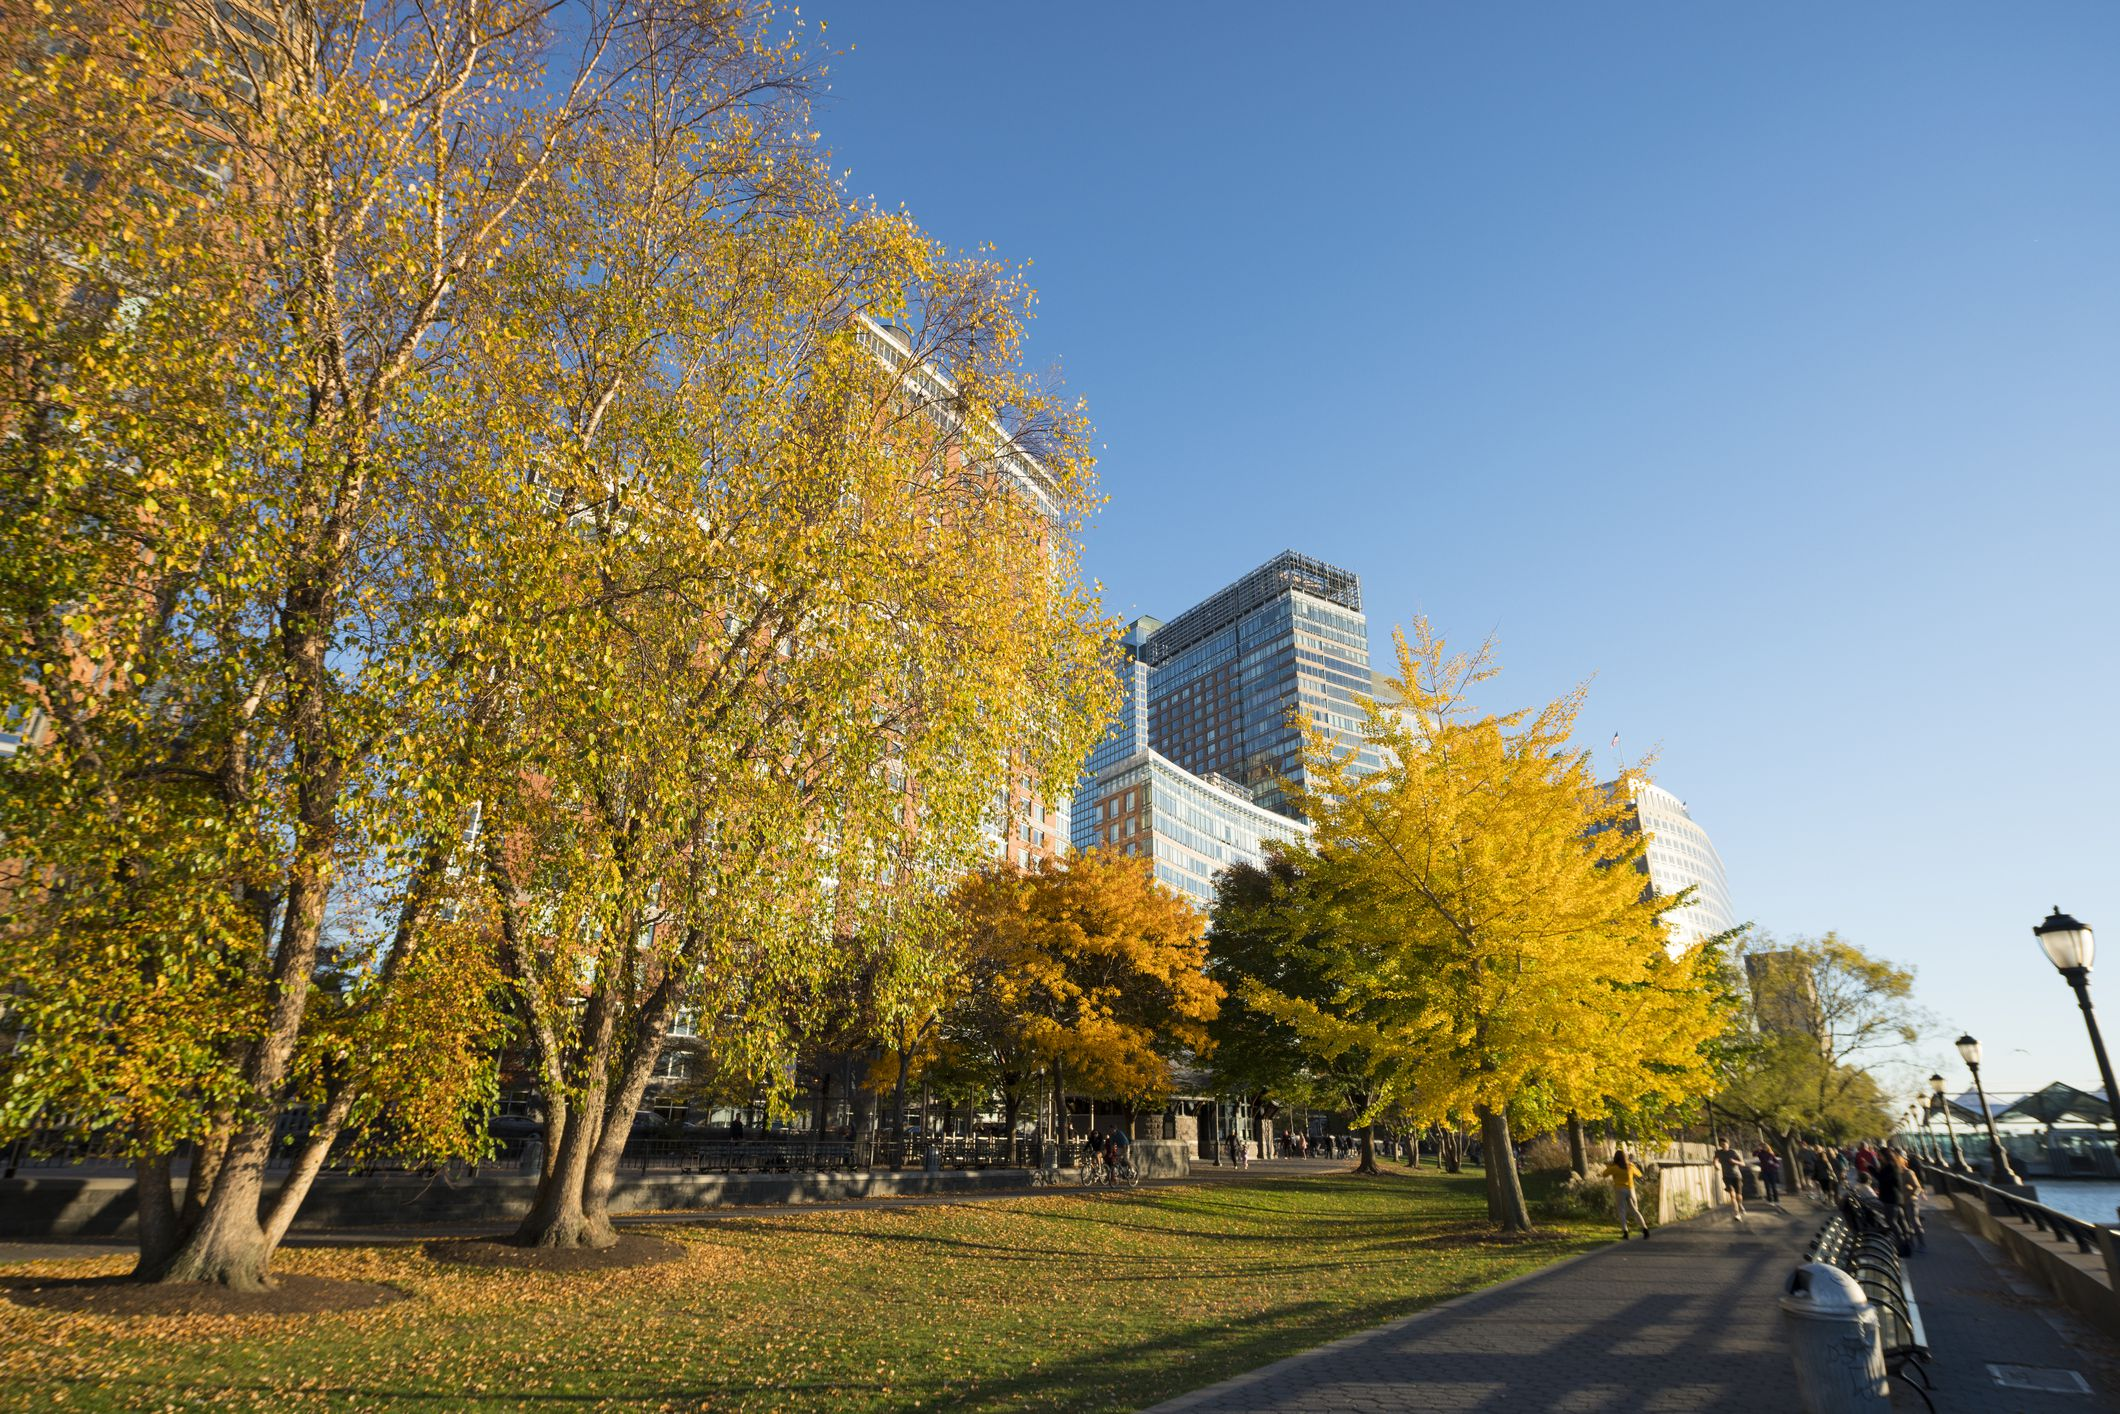 Autumnal trees in Lower Manhattan.